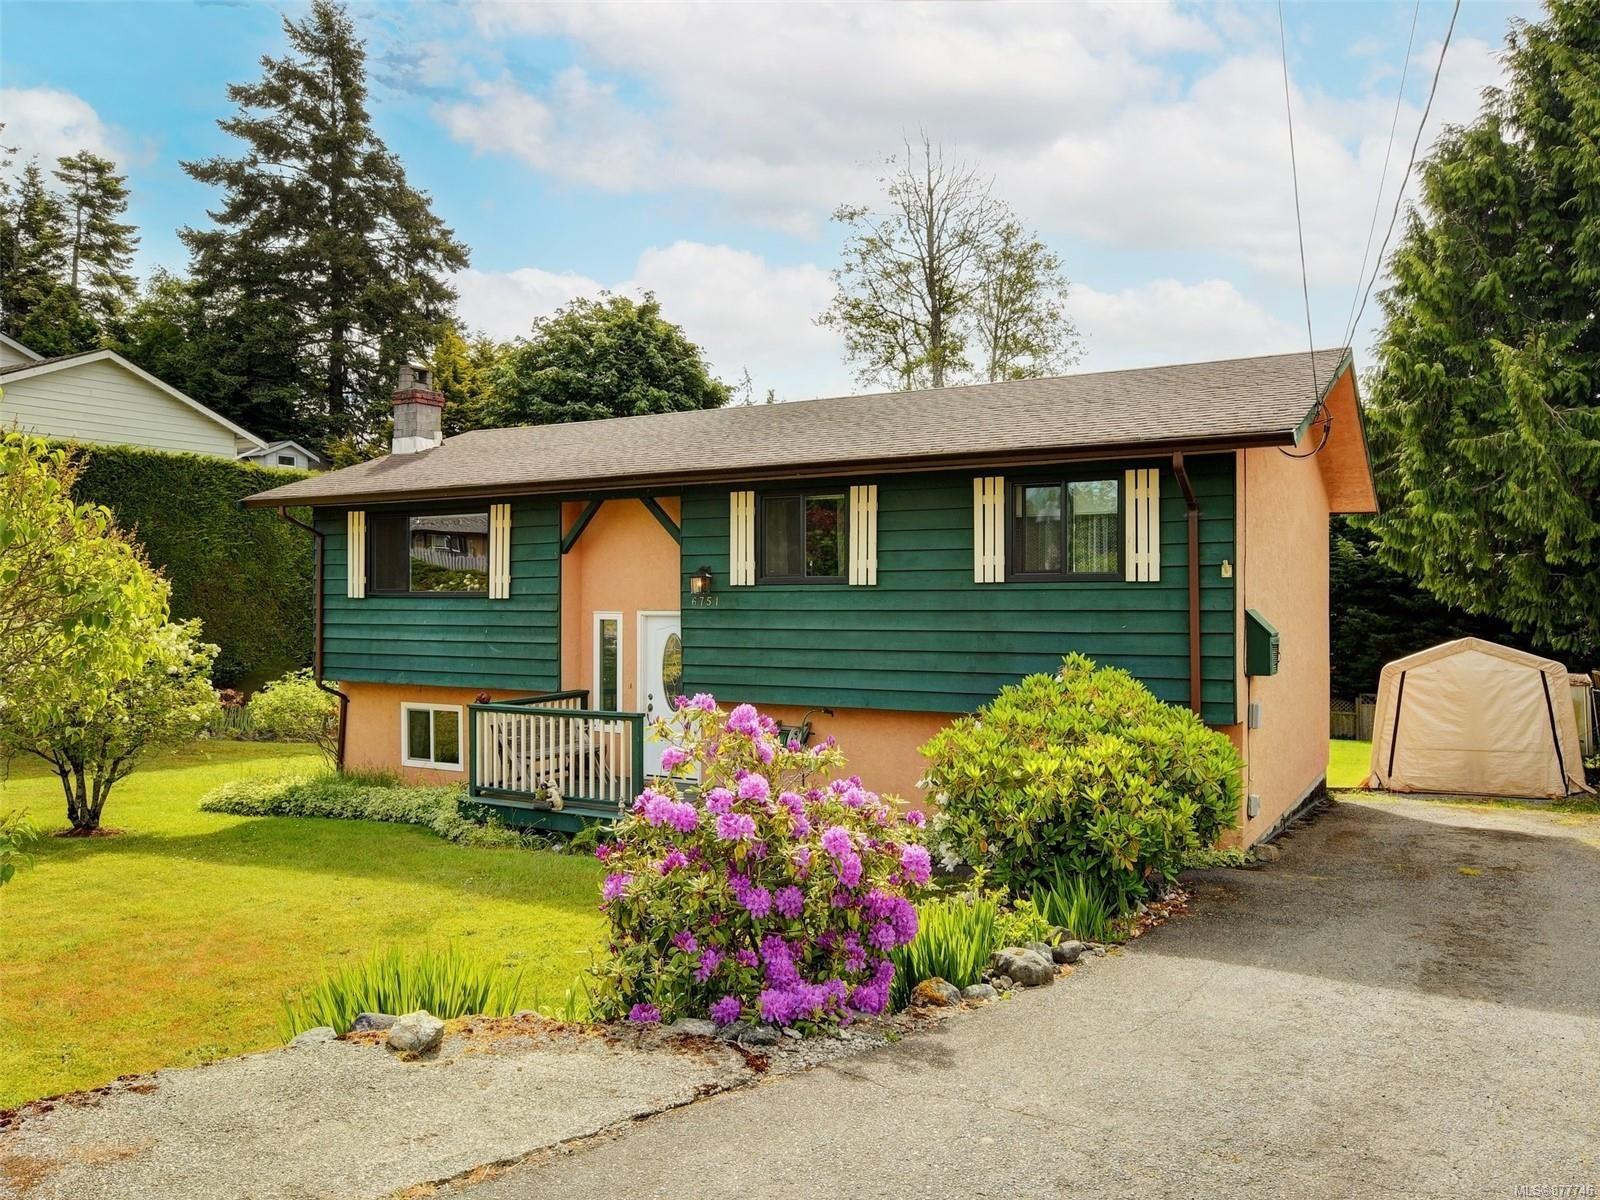 Main Photo: 6751 Eakin Dr in : Sk Broomhill House for sale (Sooke)  : MLS®# 877746